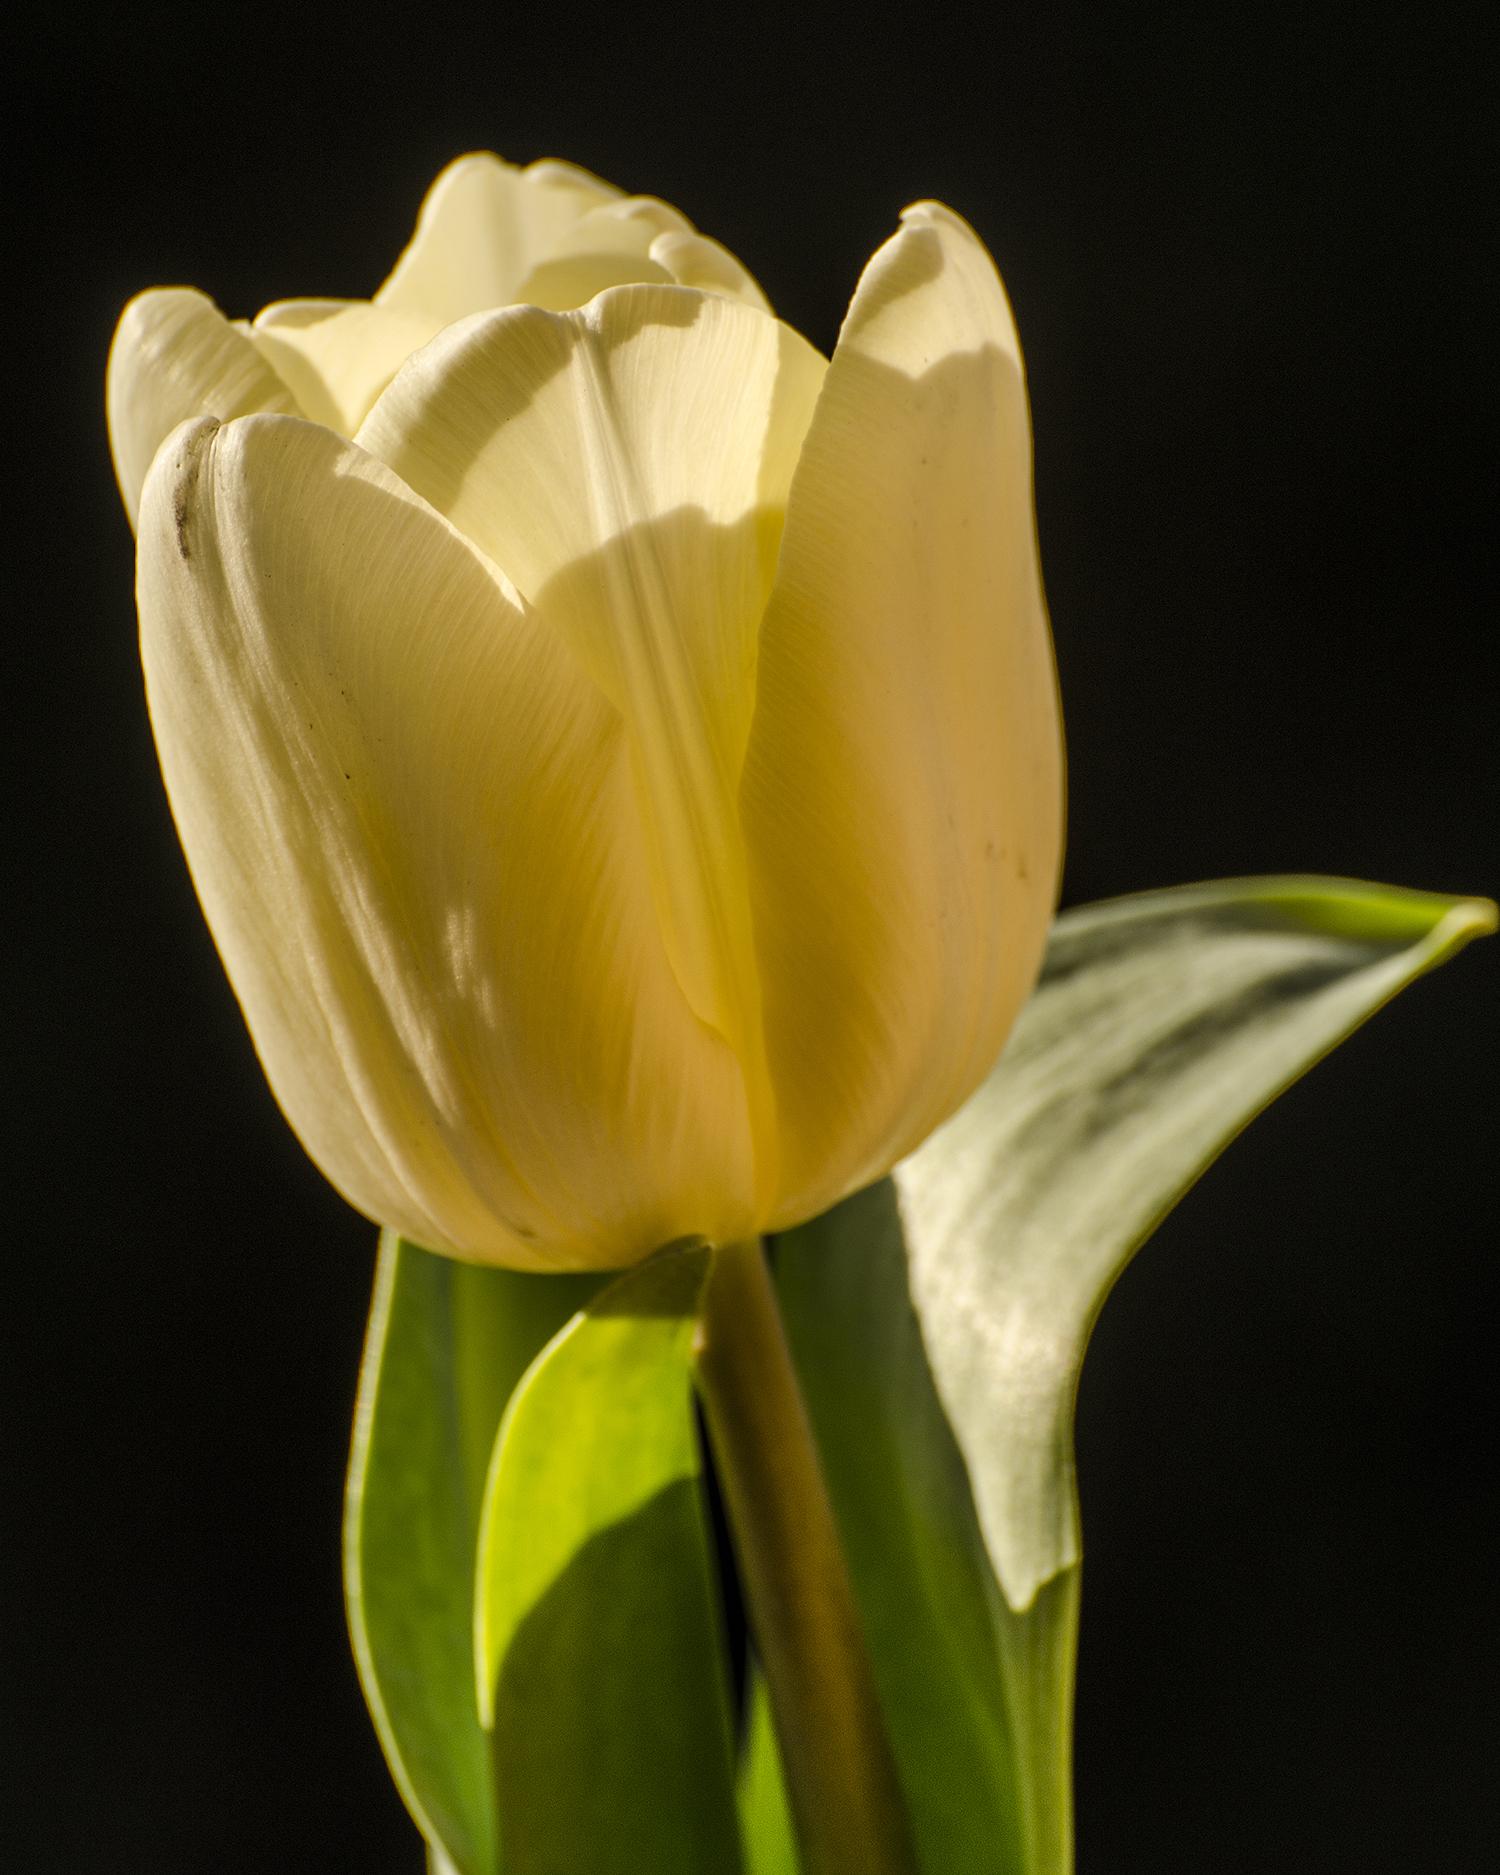 white tulip 7670.jpg